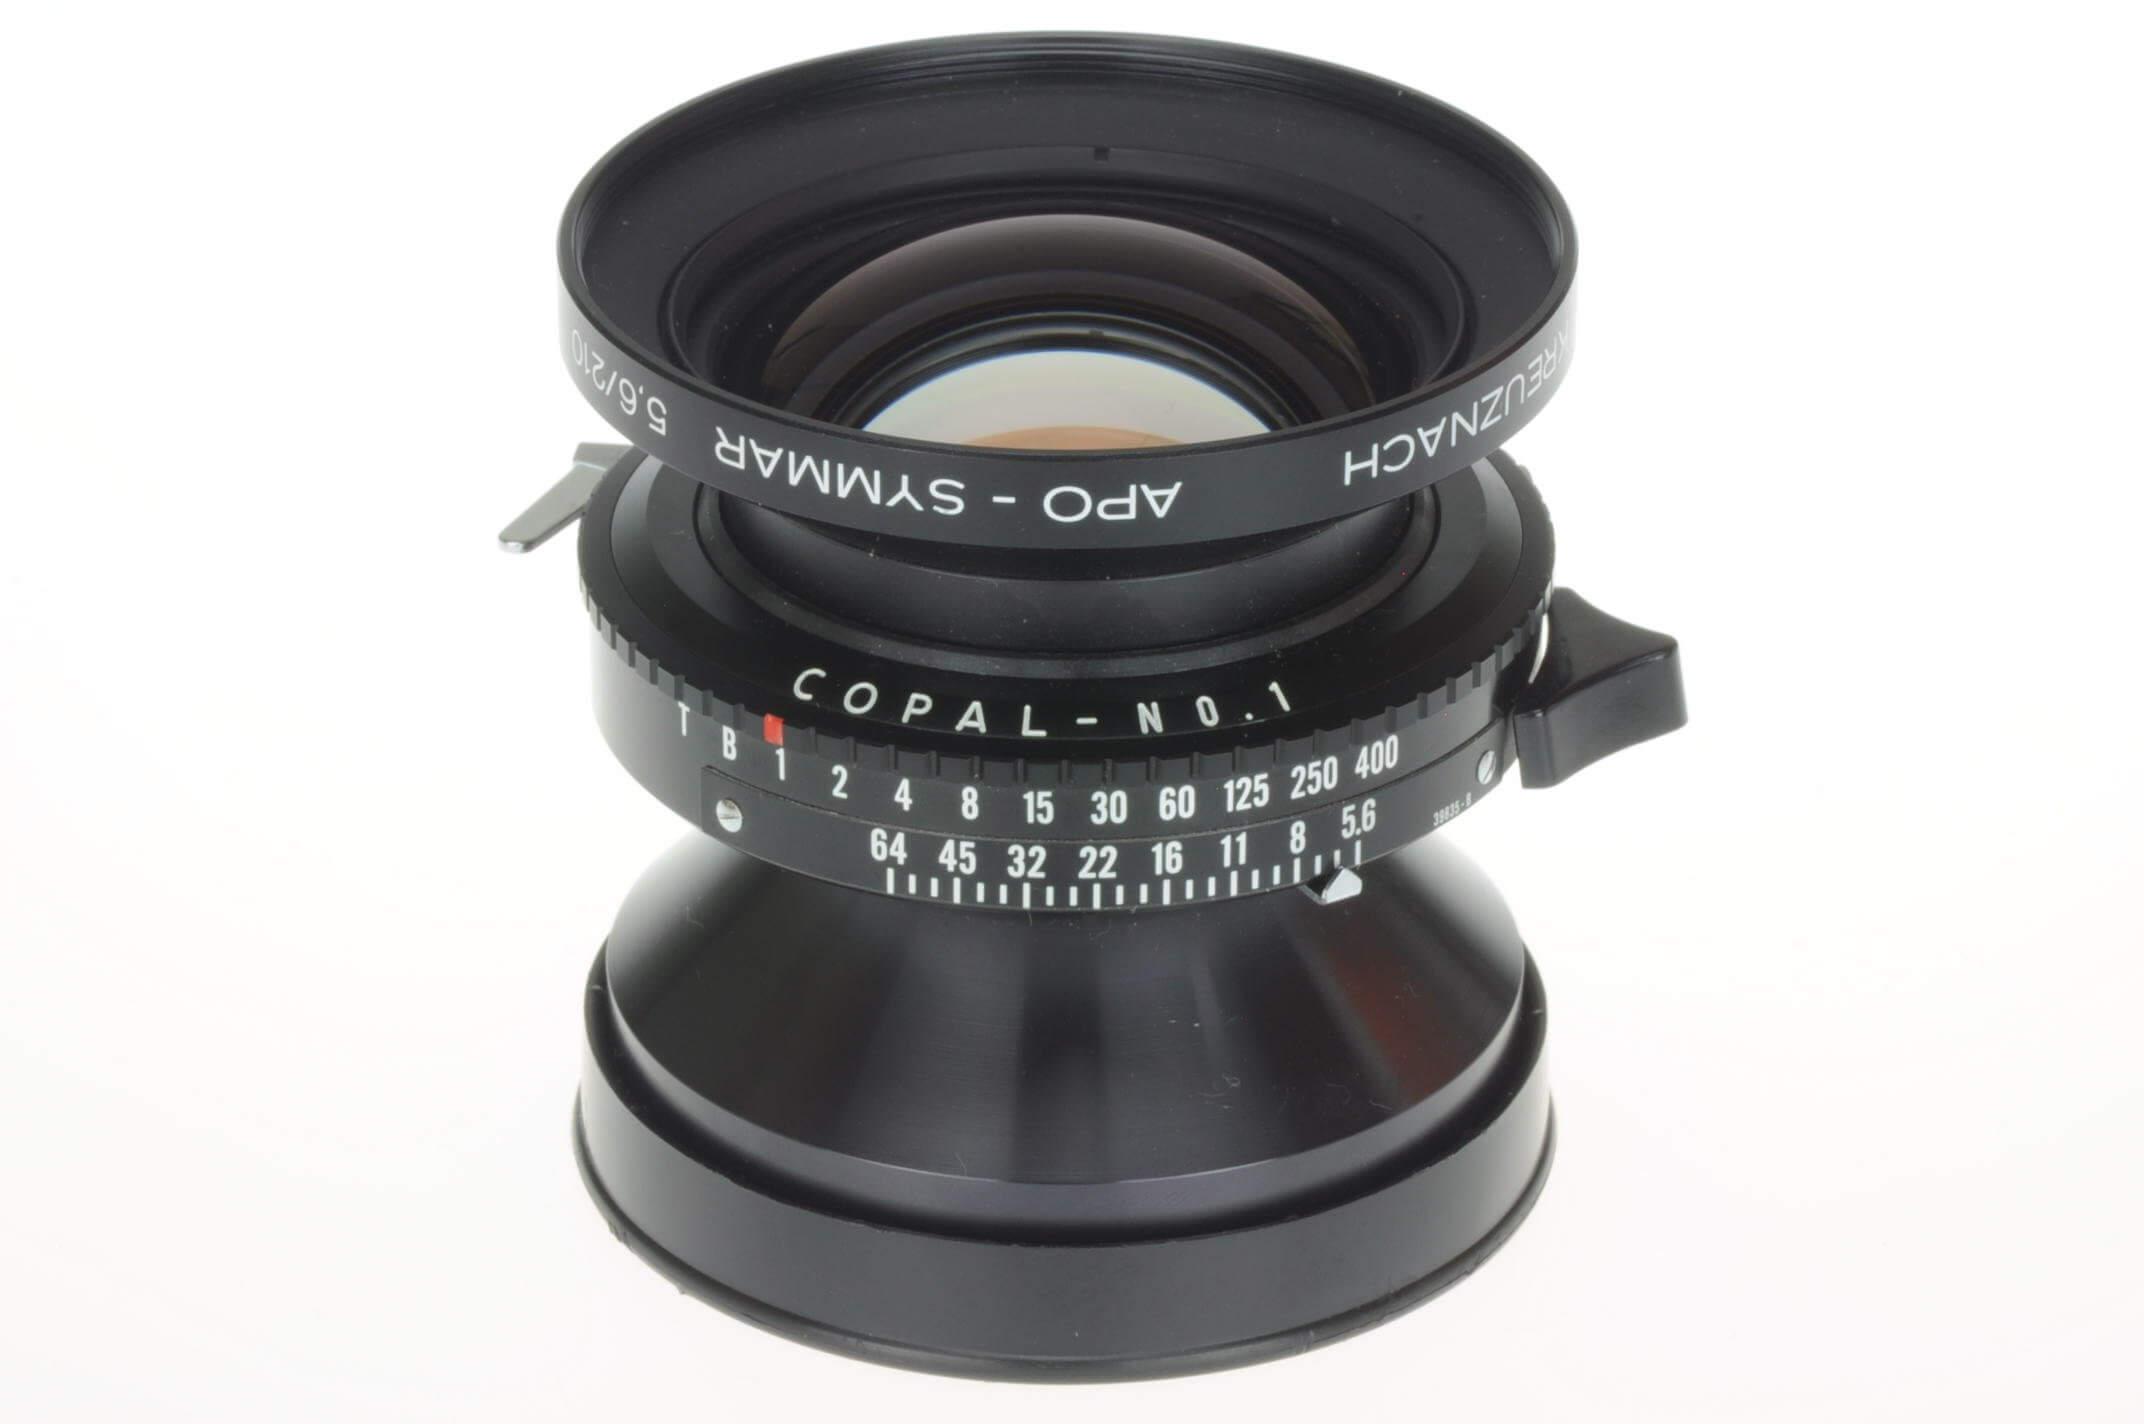 Schneider 210mm f5.6 Apo Symmar lens in Copal 1 shutter Mint!